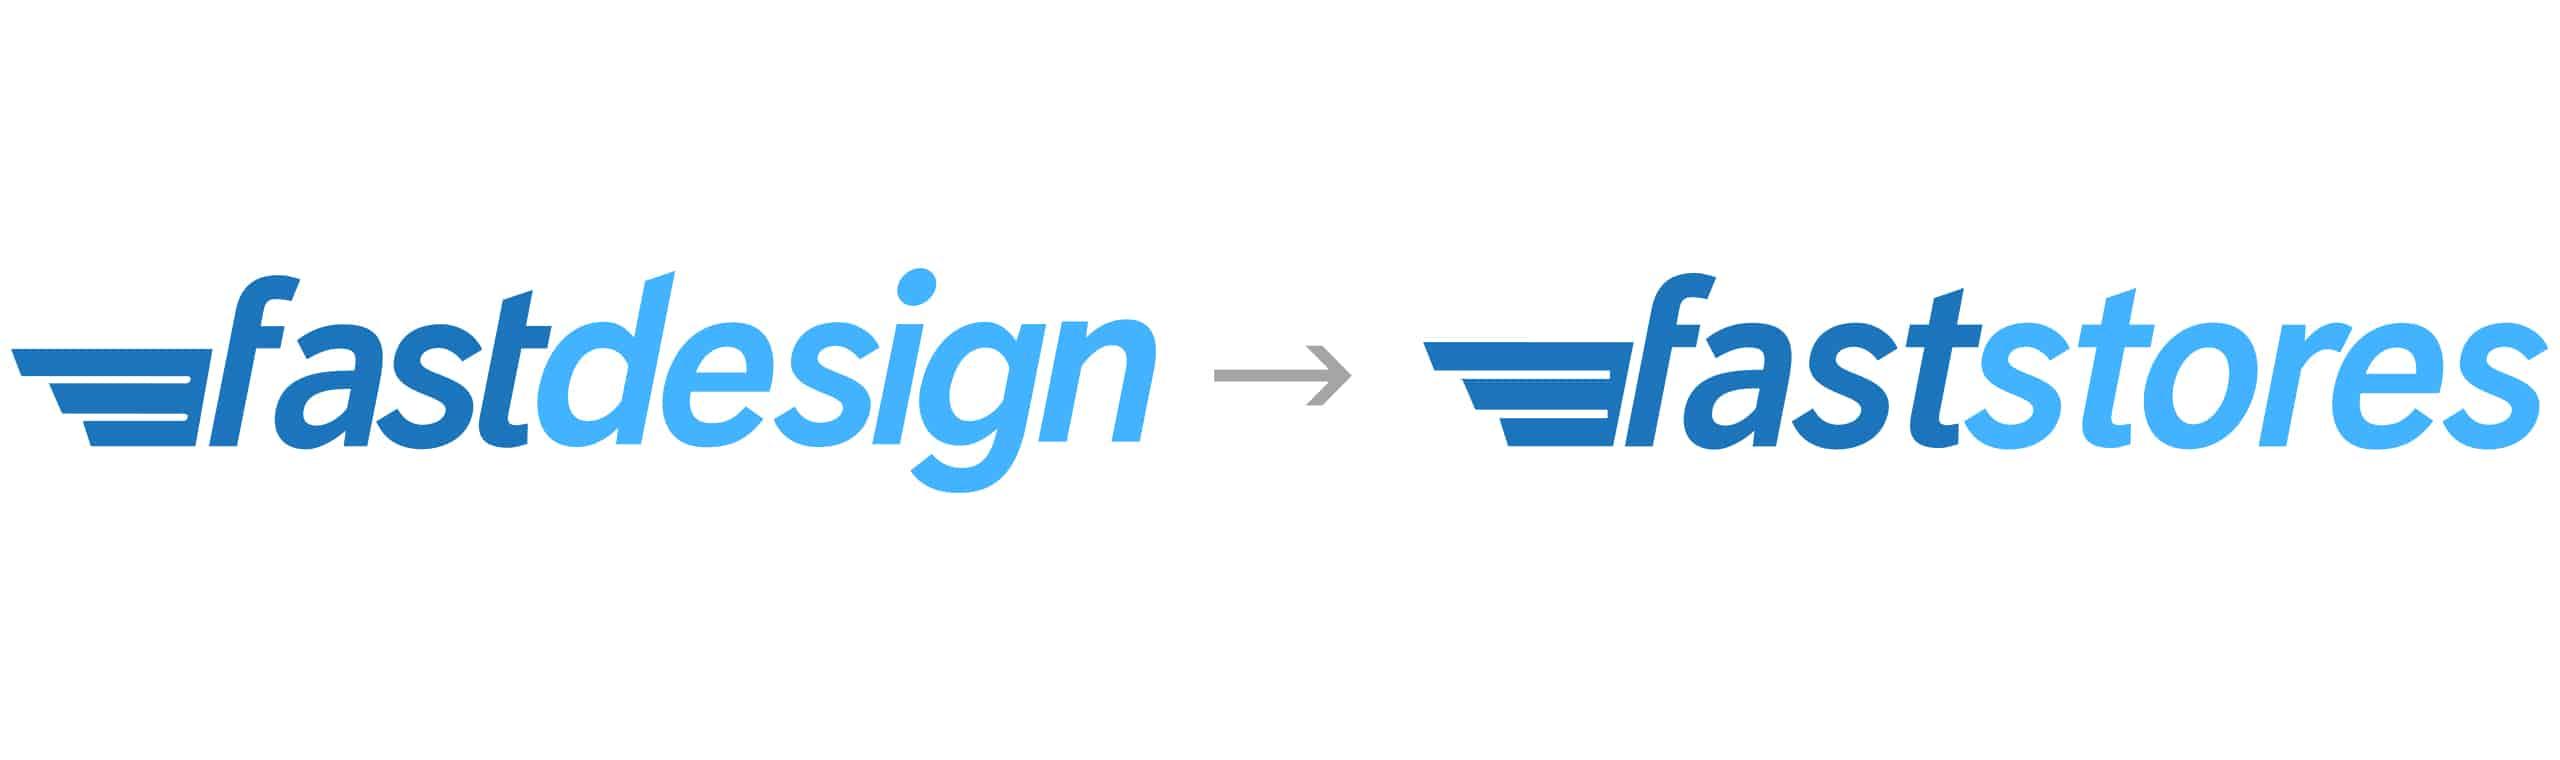 fastdesign faststores rebrand